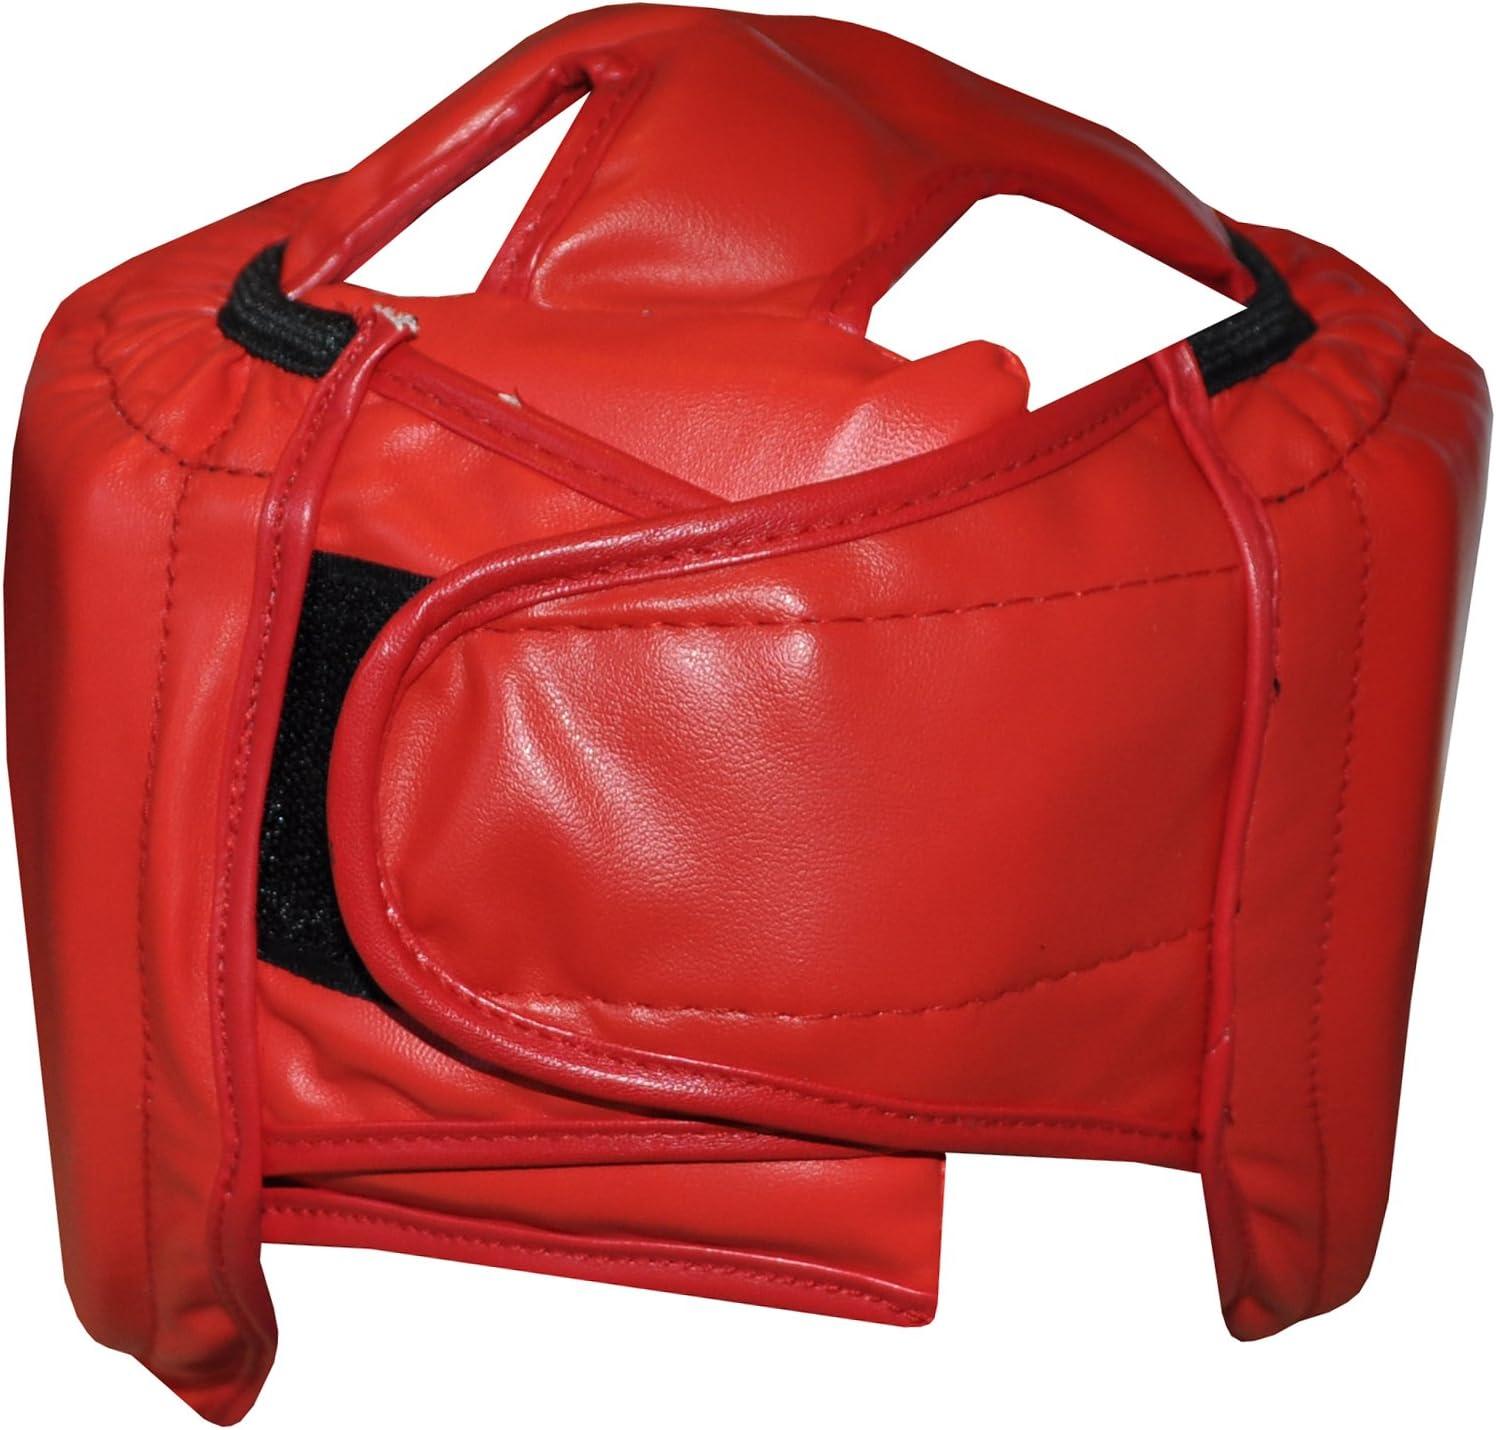 Komonee Adult Boxing Head Guard Full Face Helmet Protection MMA Martial Arts Muay Thai